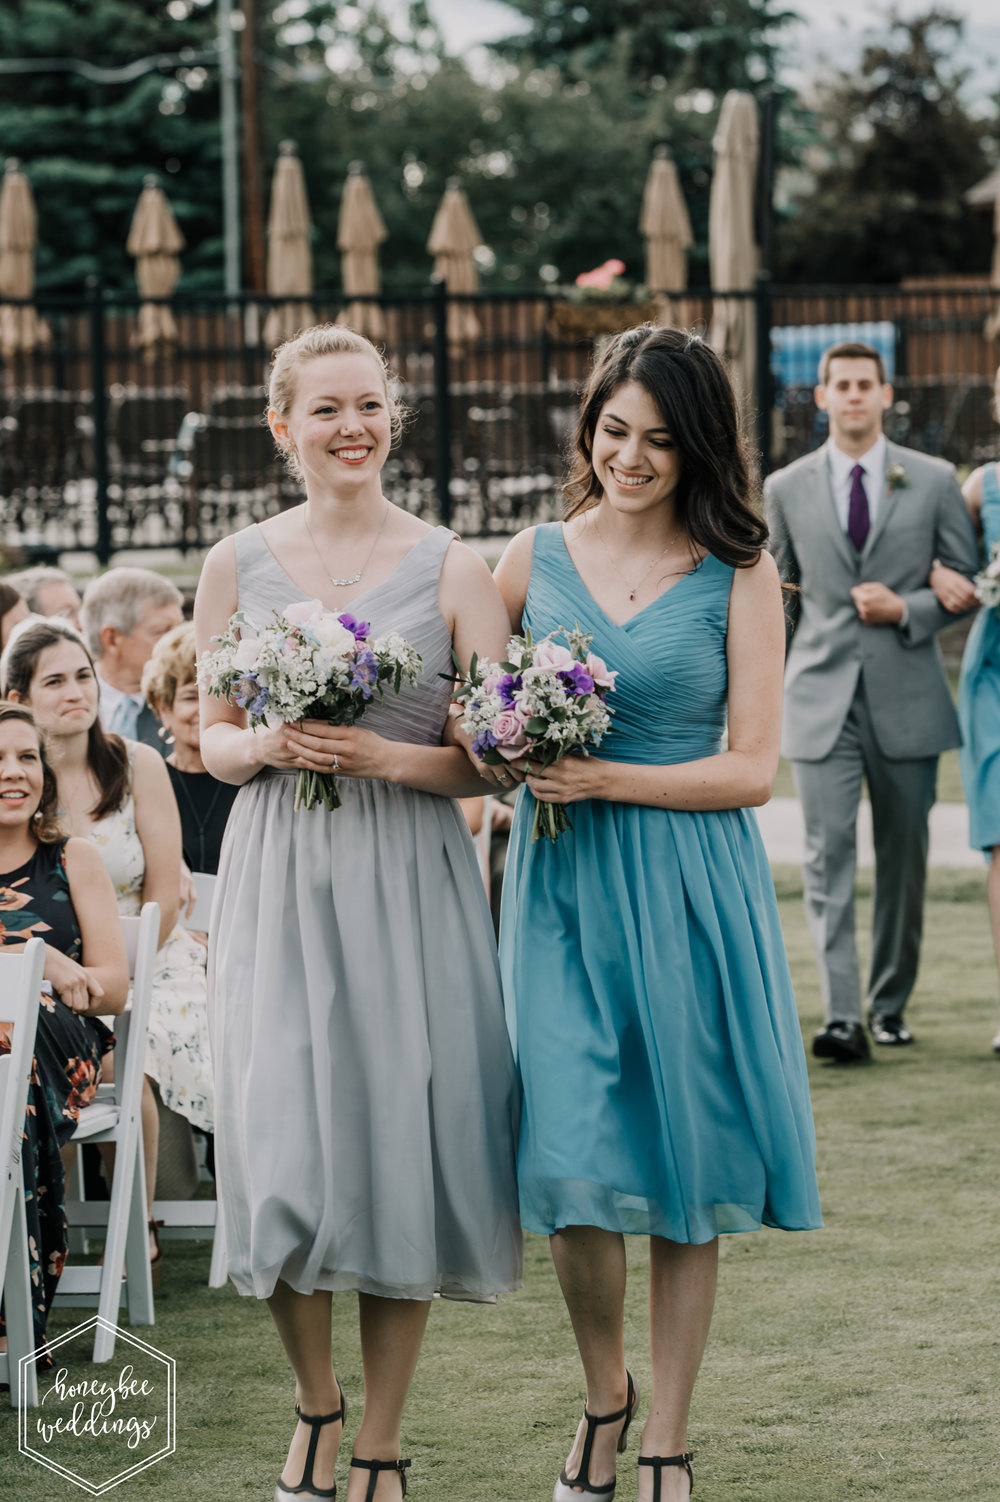 545 Riverside Country Club Wedding_Montana Wedding Photographer_Lauren Jackson + Evan Ivaldi 2018-6584.jpg